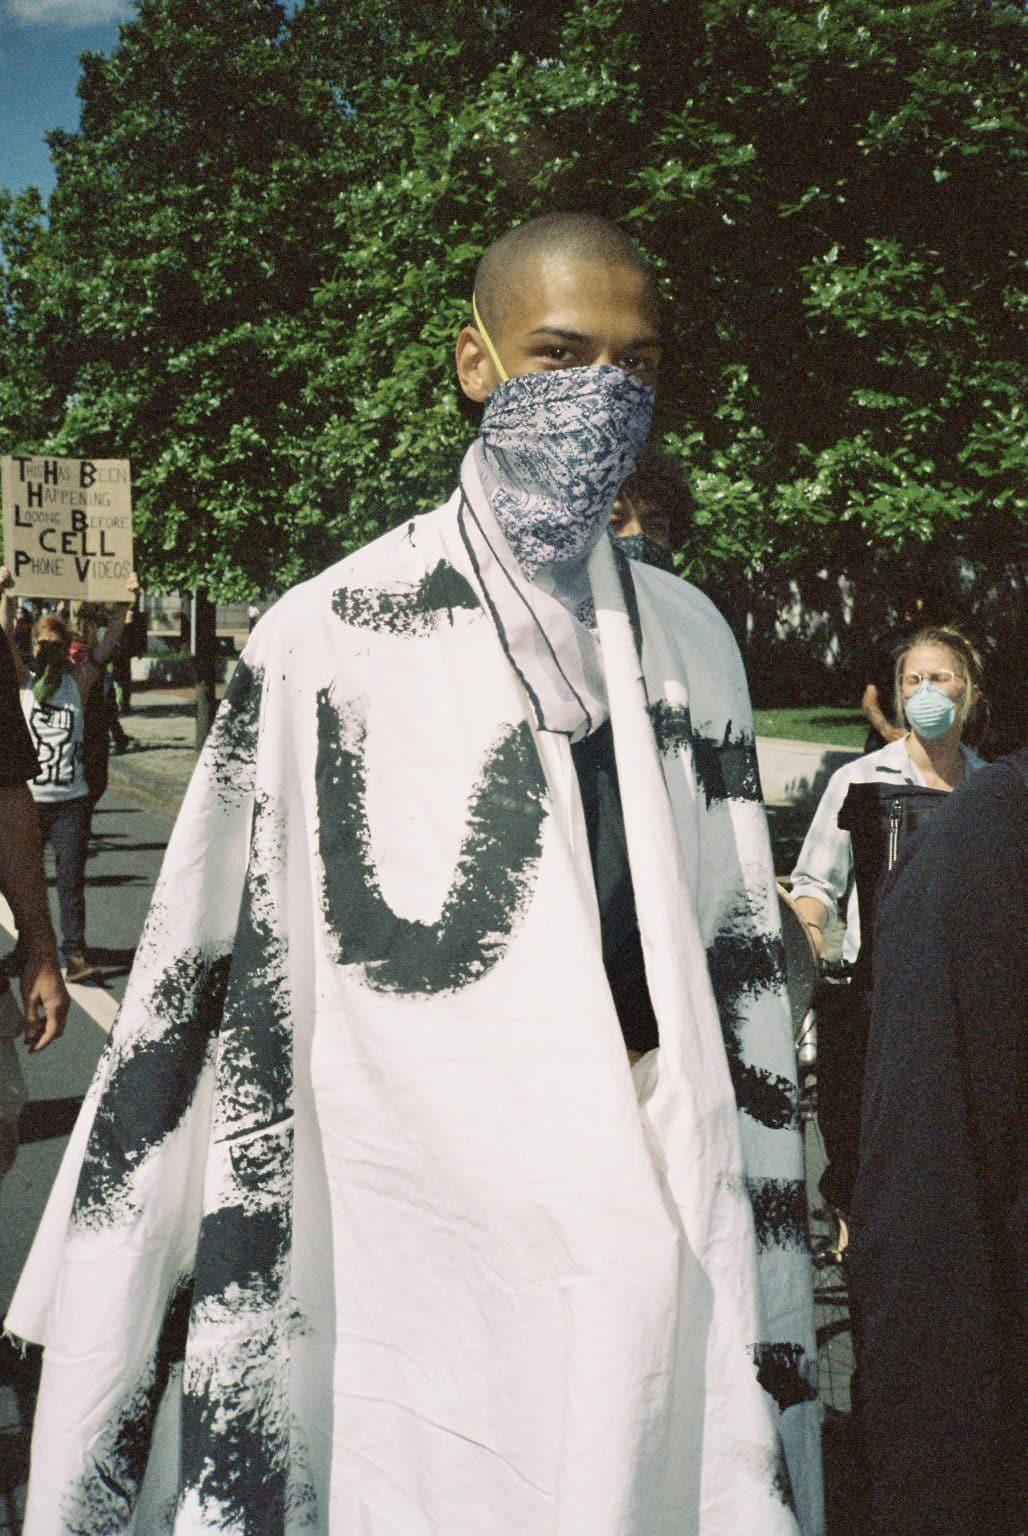 sheldon omar abba peoples film program artist activist african american man wearing a mask black lives matter george floyd protests photo philadelphia creative repute graphic design agency